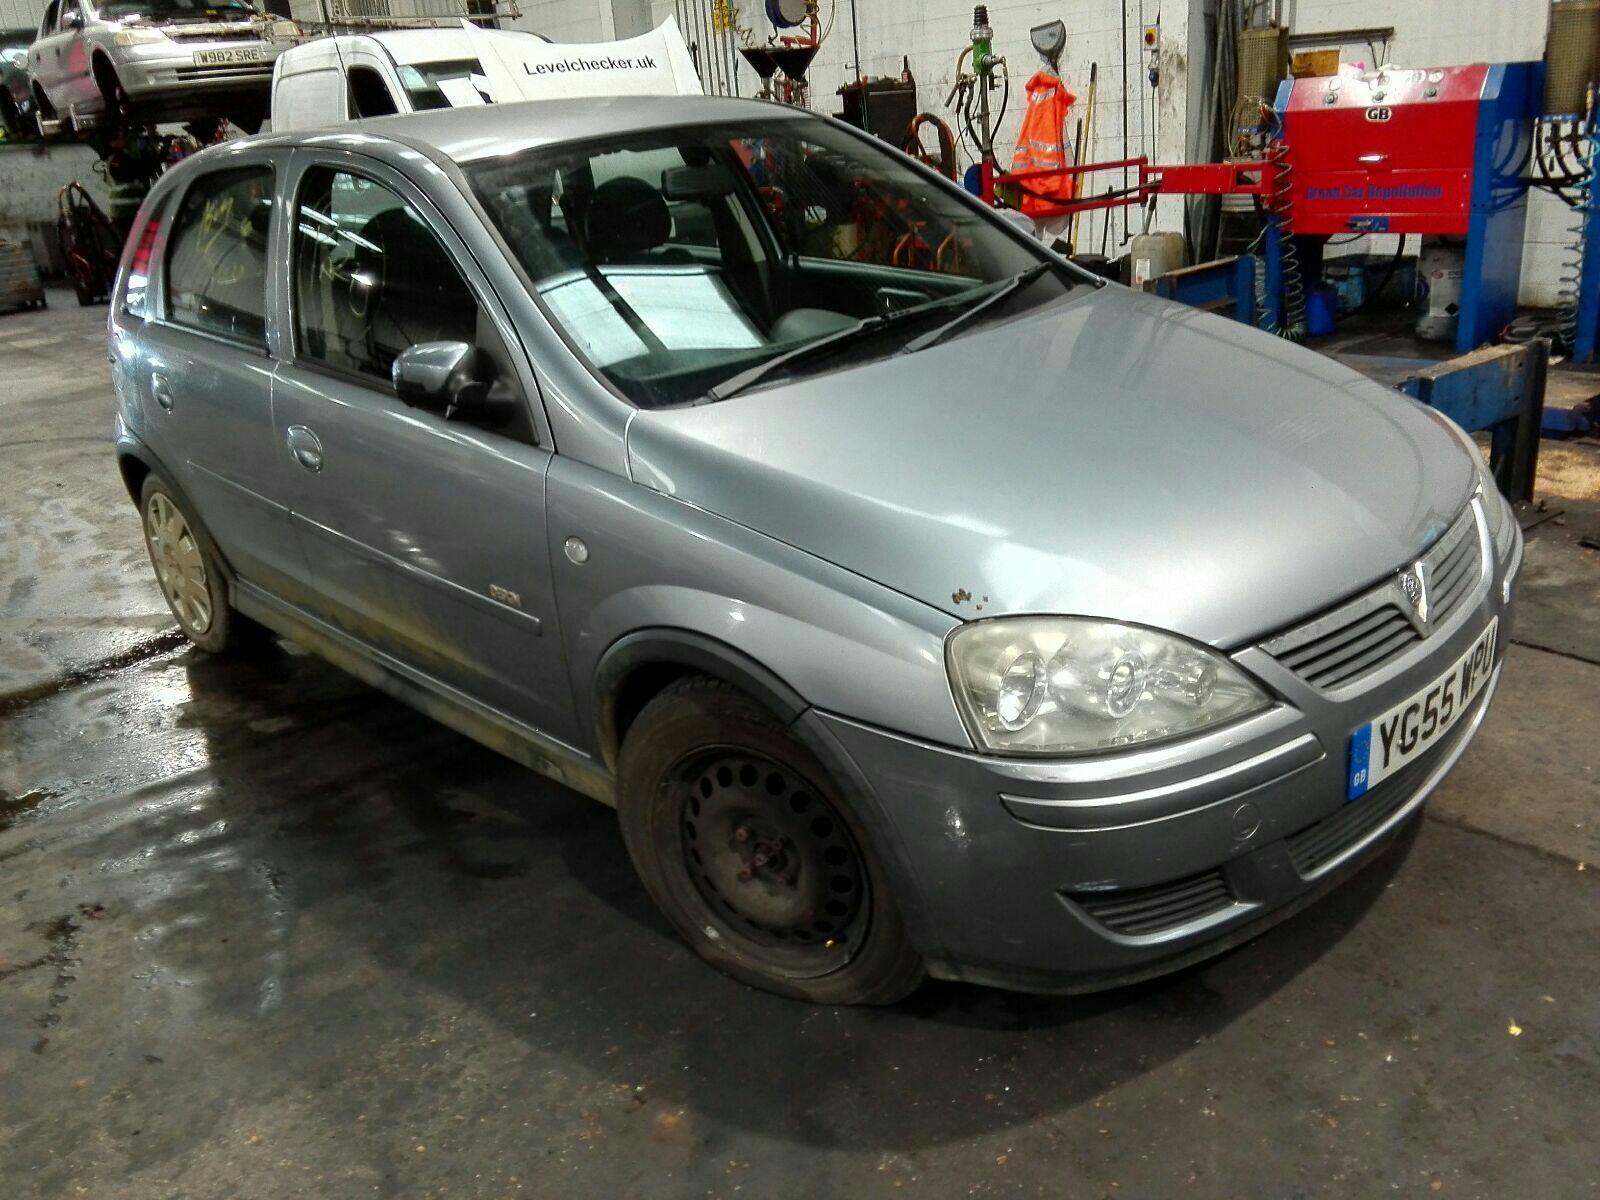 Image for a Vauxhall Corsa 2005 5 Door Hatchback